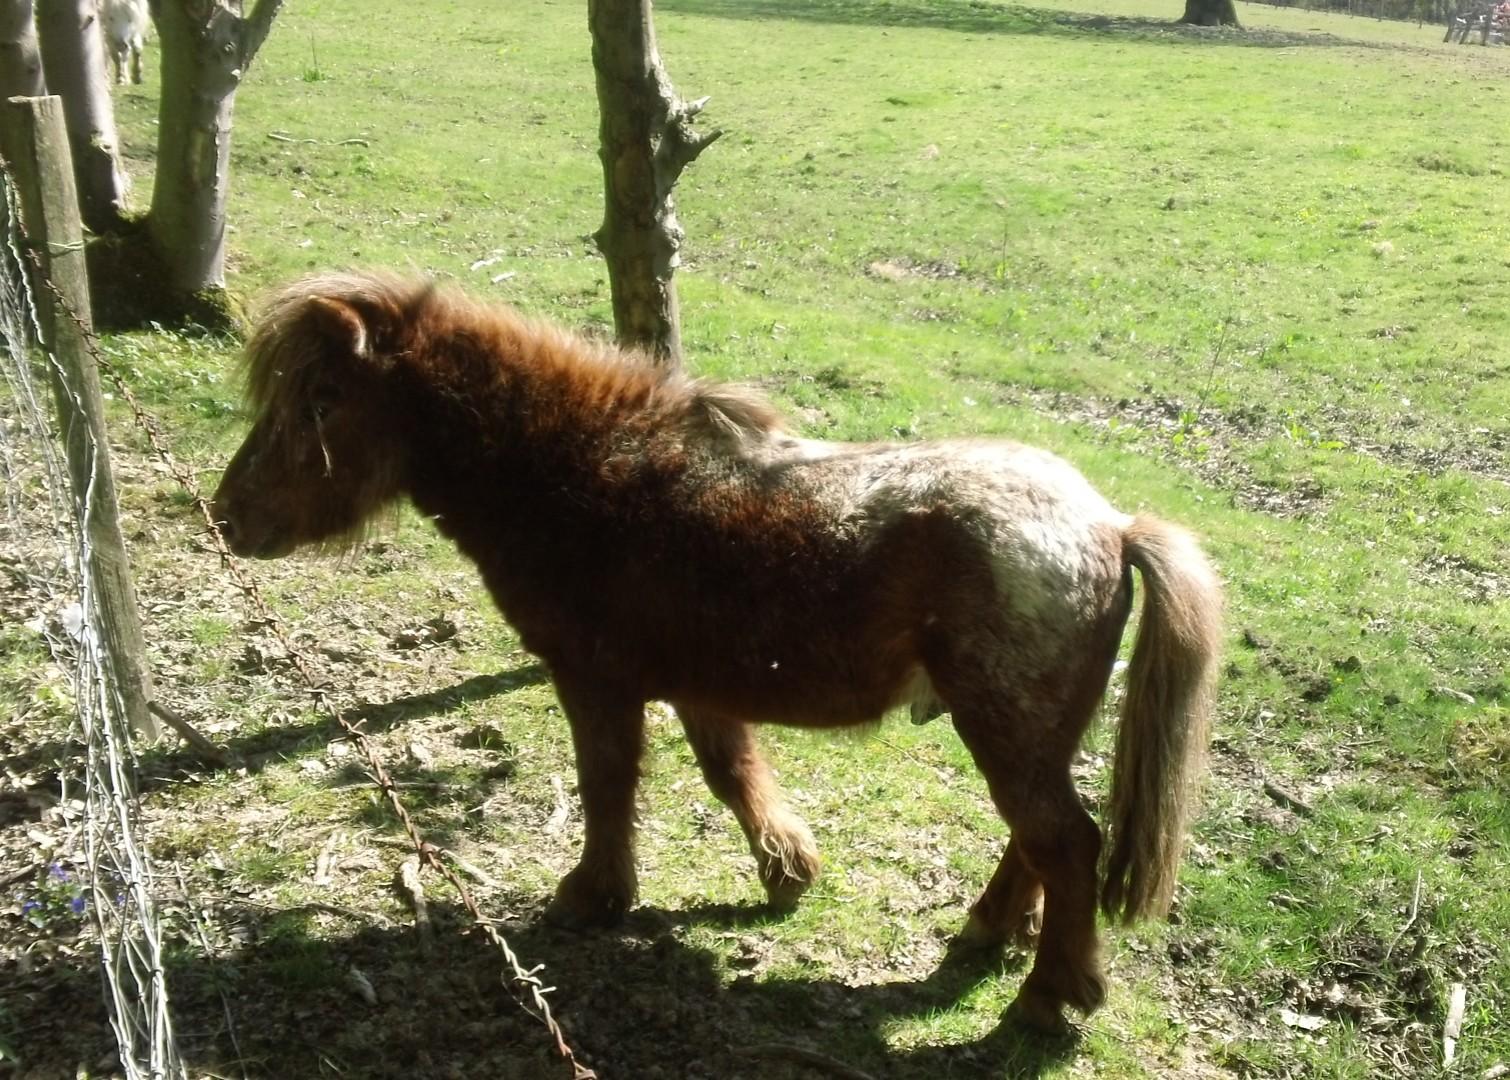 Friendly pony... before reinforcements arrive...